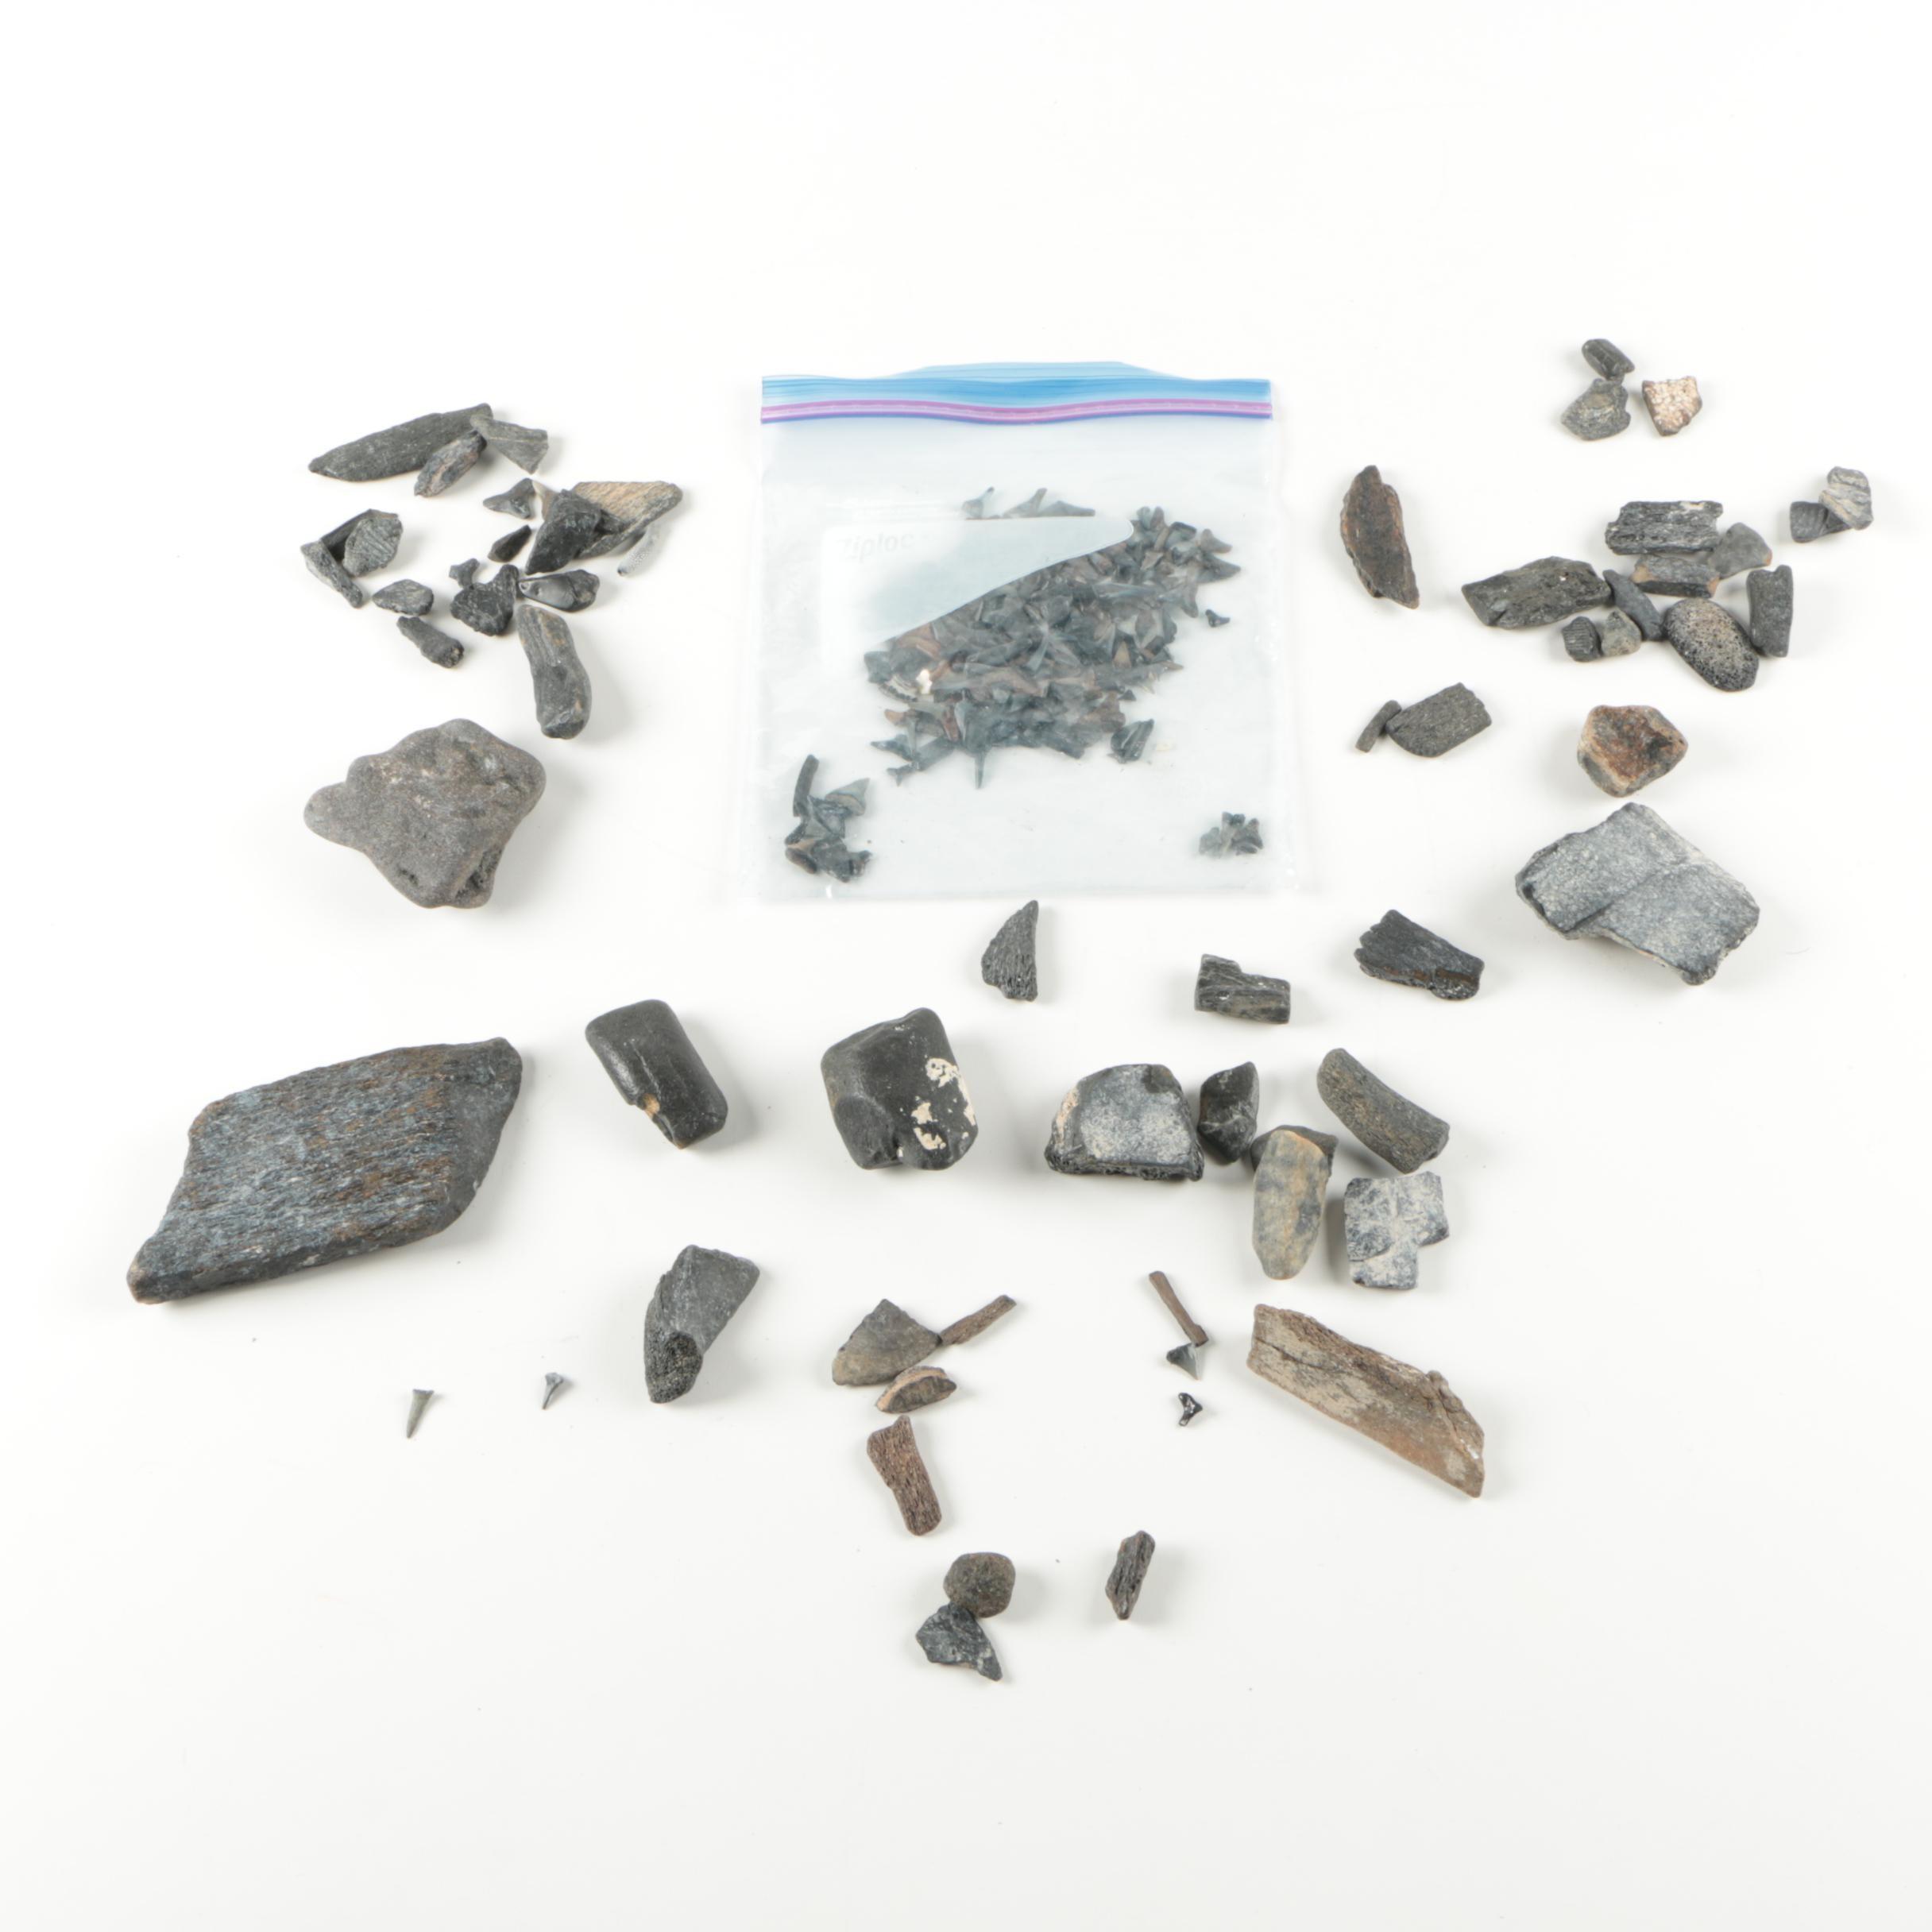 Recent Vertebrate Fossil Specimens